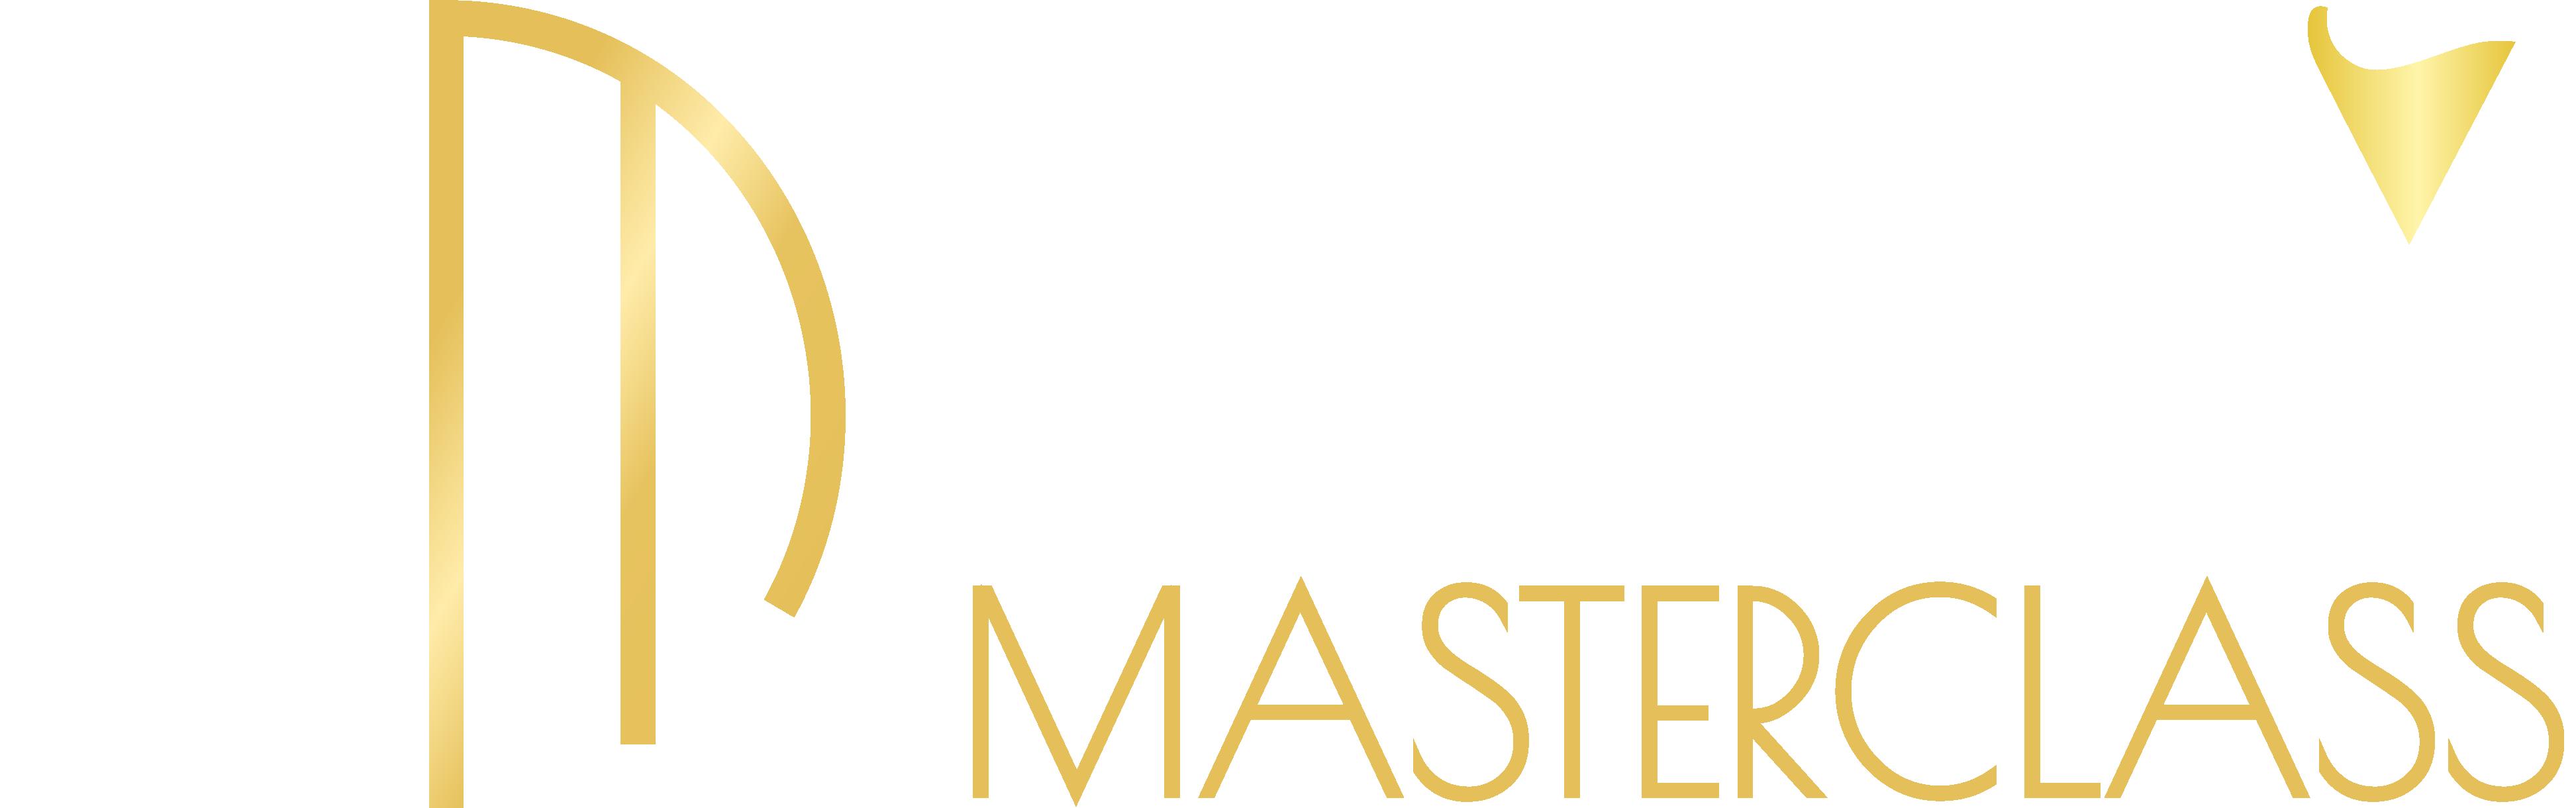 Party Masterclass